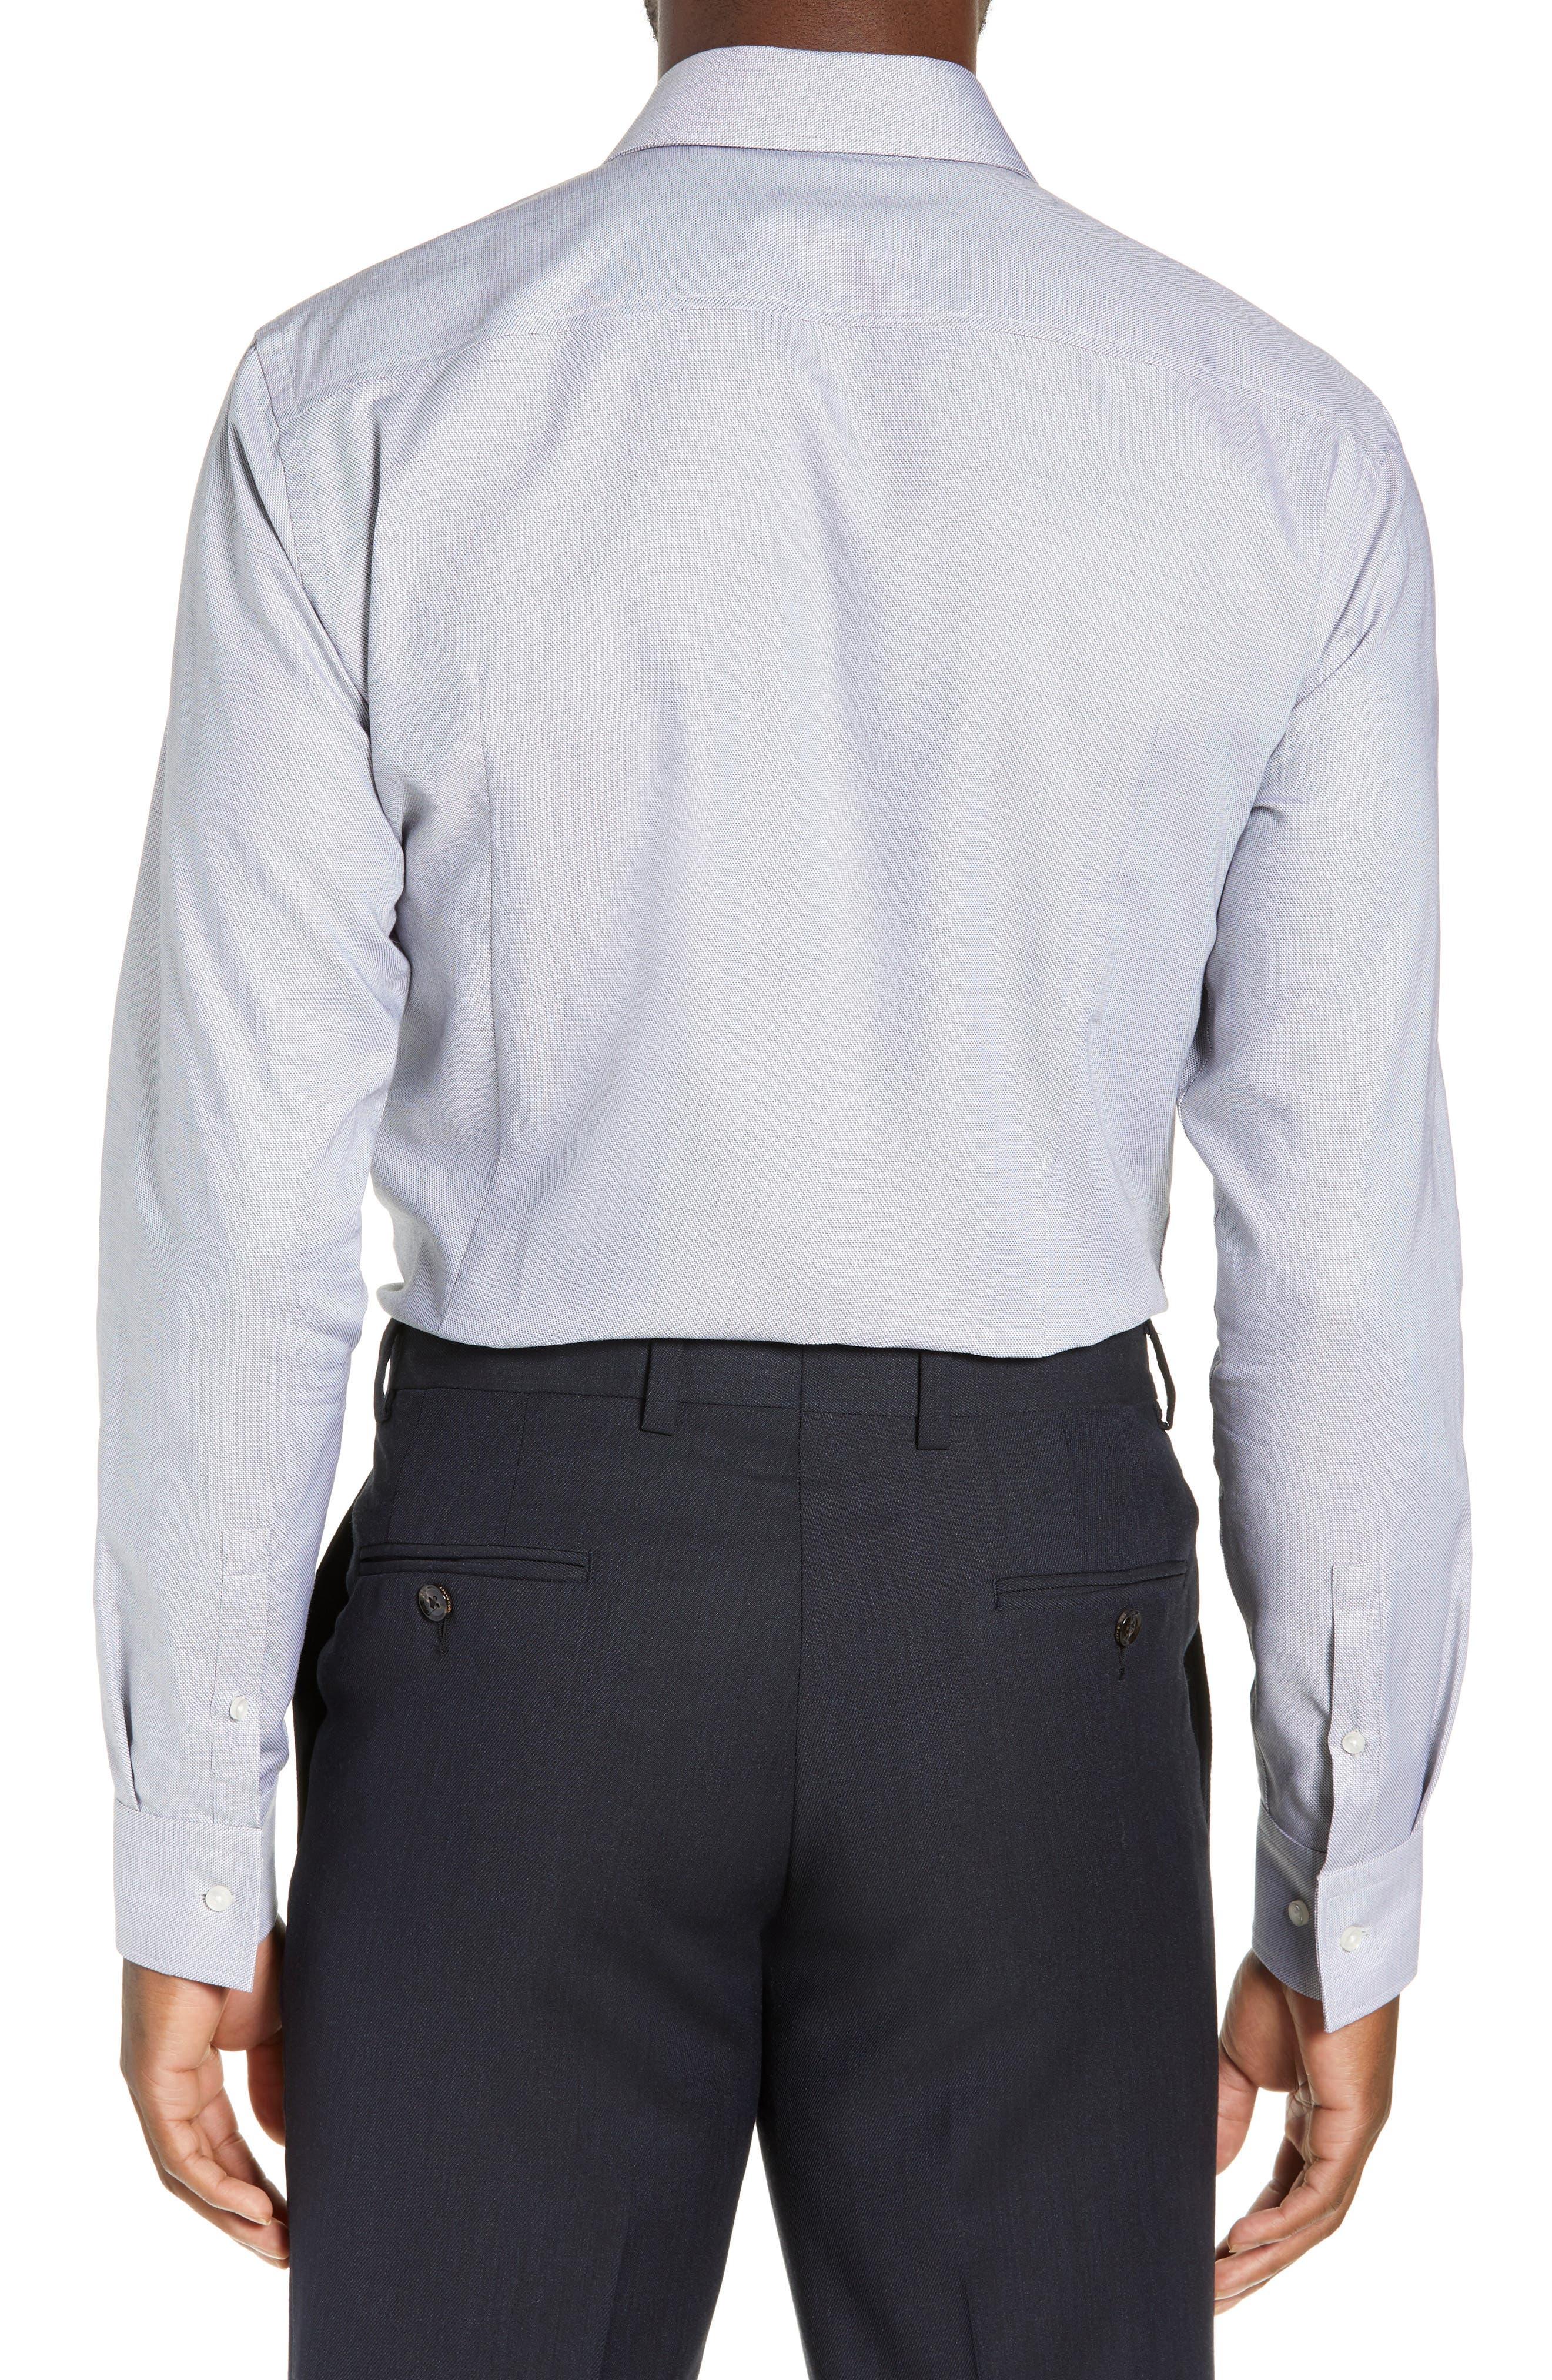 Jason Trim Fit Solid Dress Shirt,                             Alternate thumbnail 3, color,                             BLACK